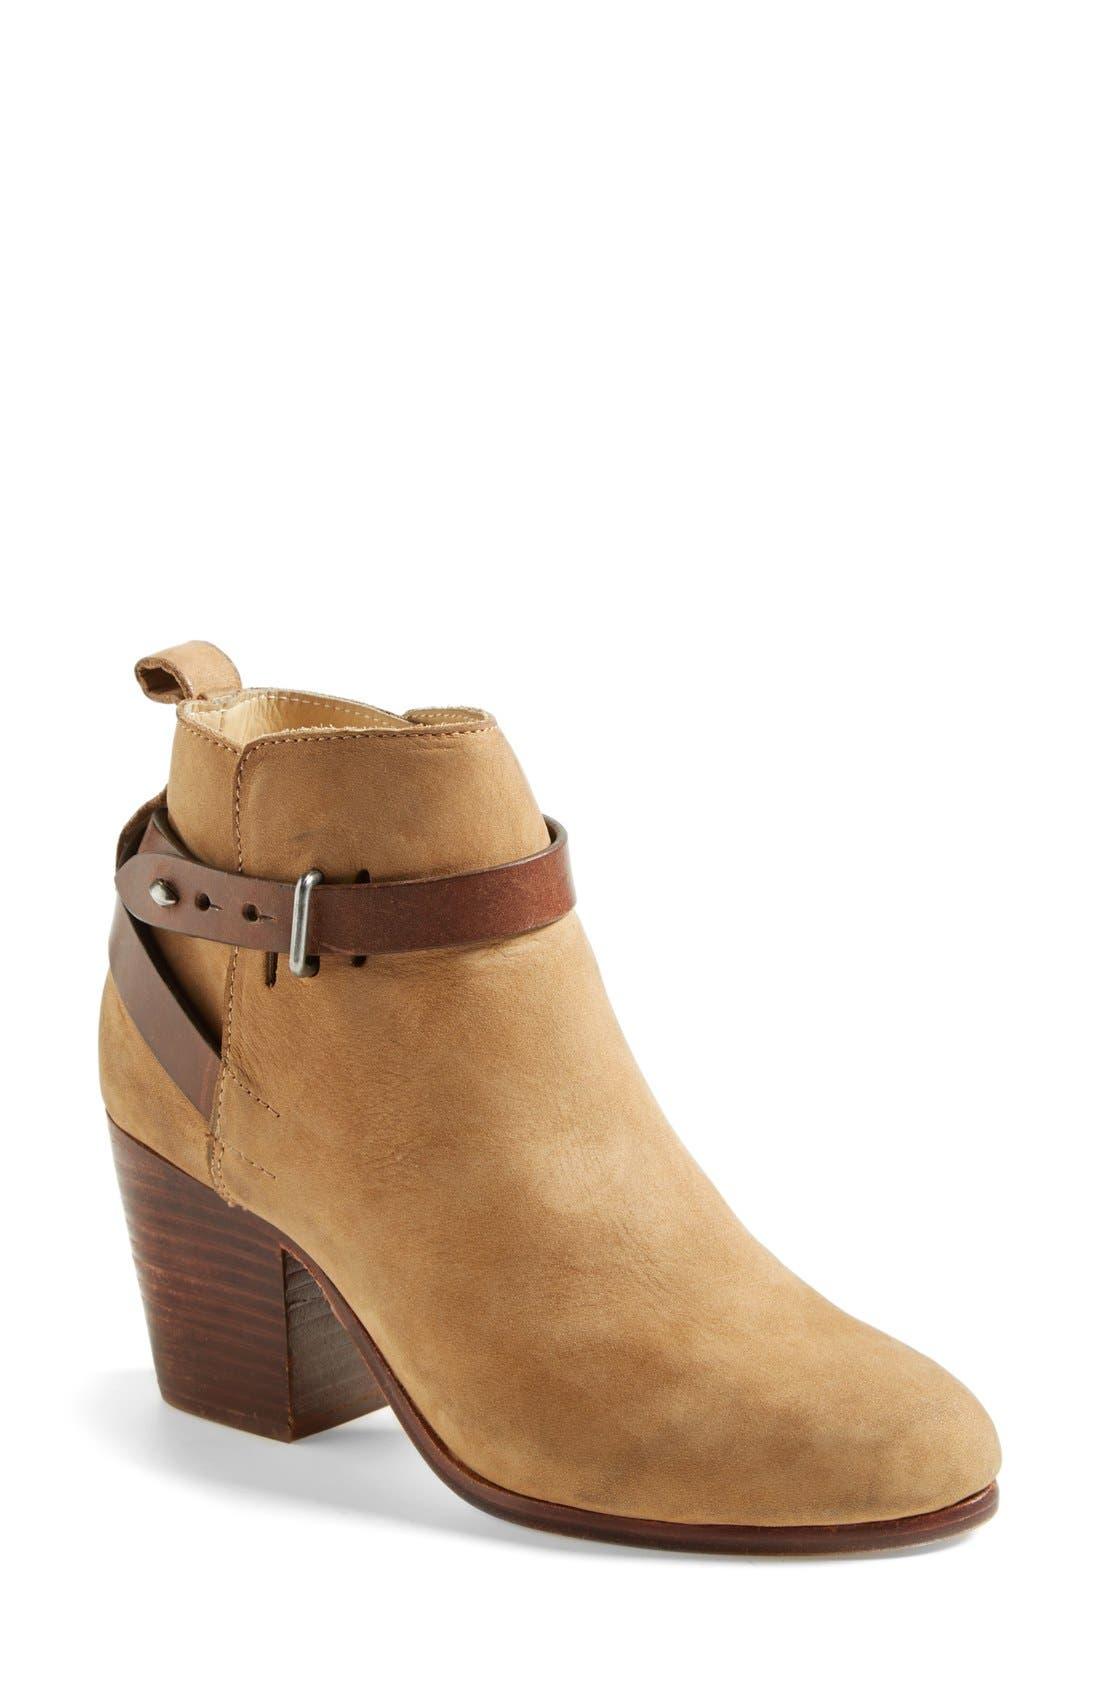 Alternate Image 1 Selected - rag & bone 'Dalton' Boot (Women)